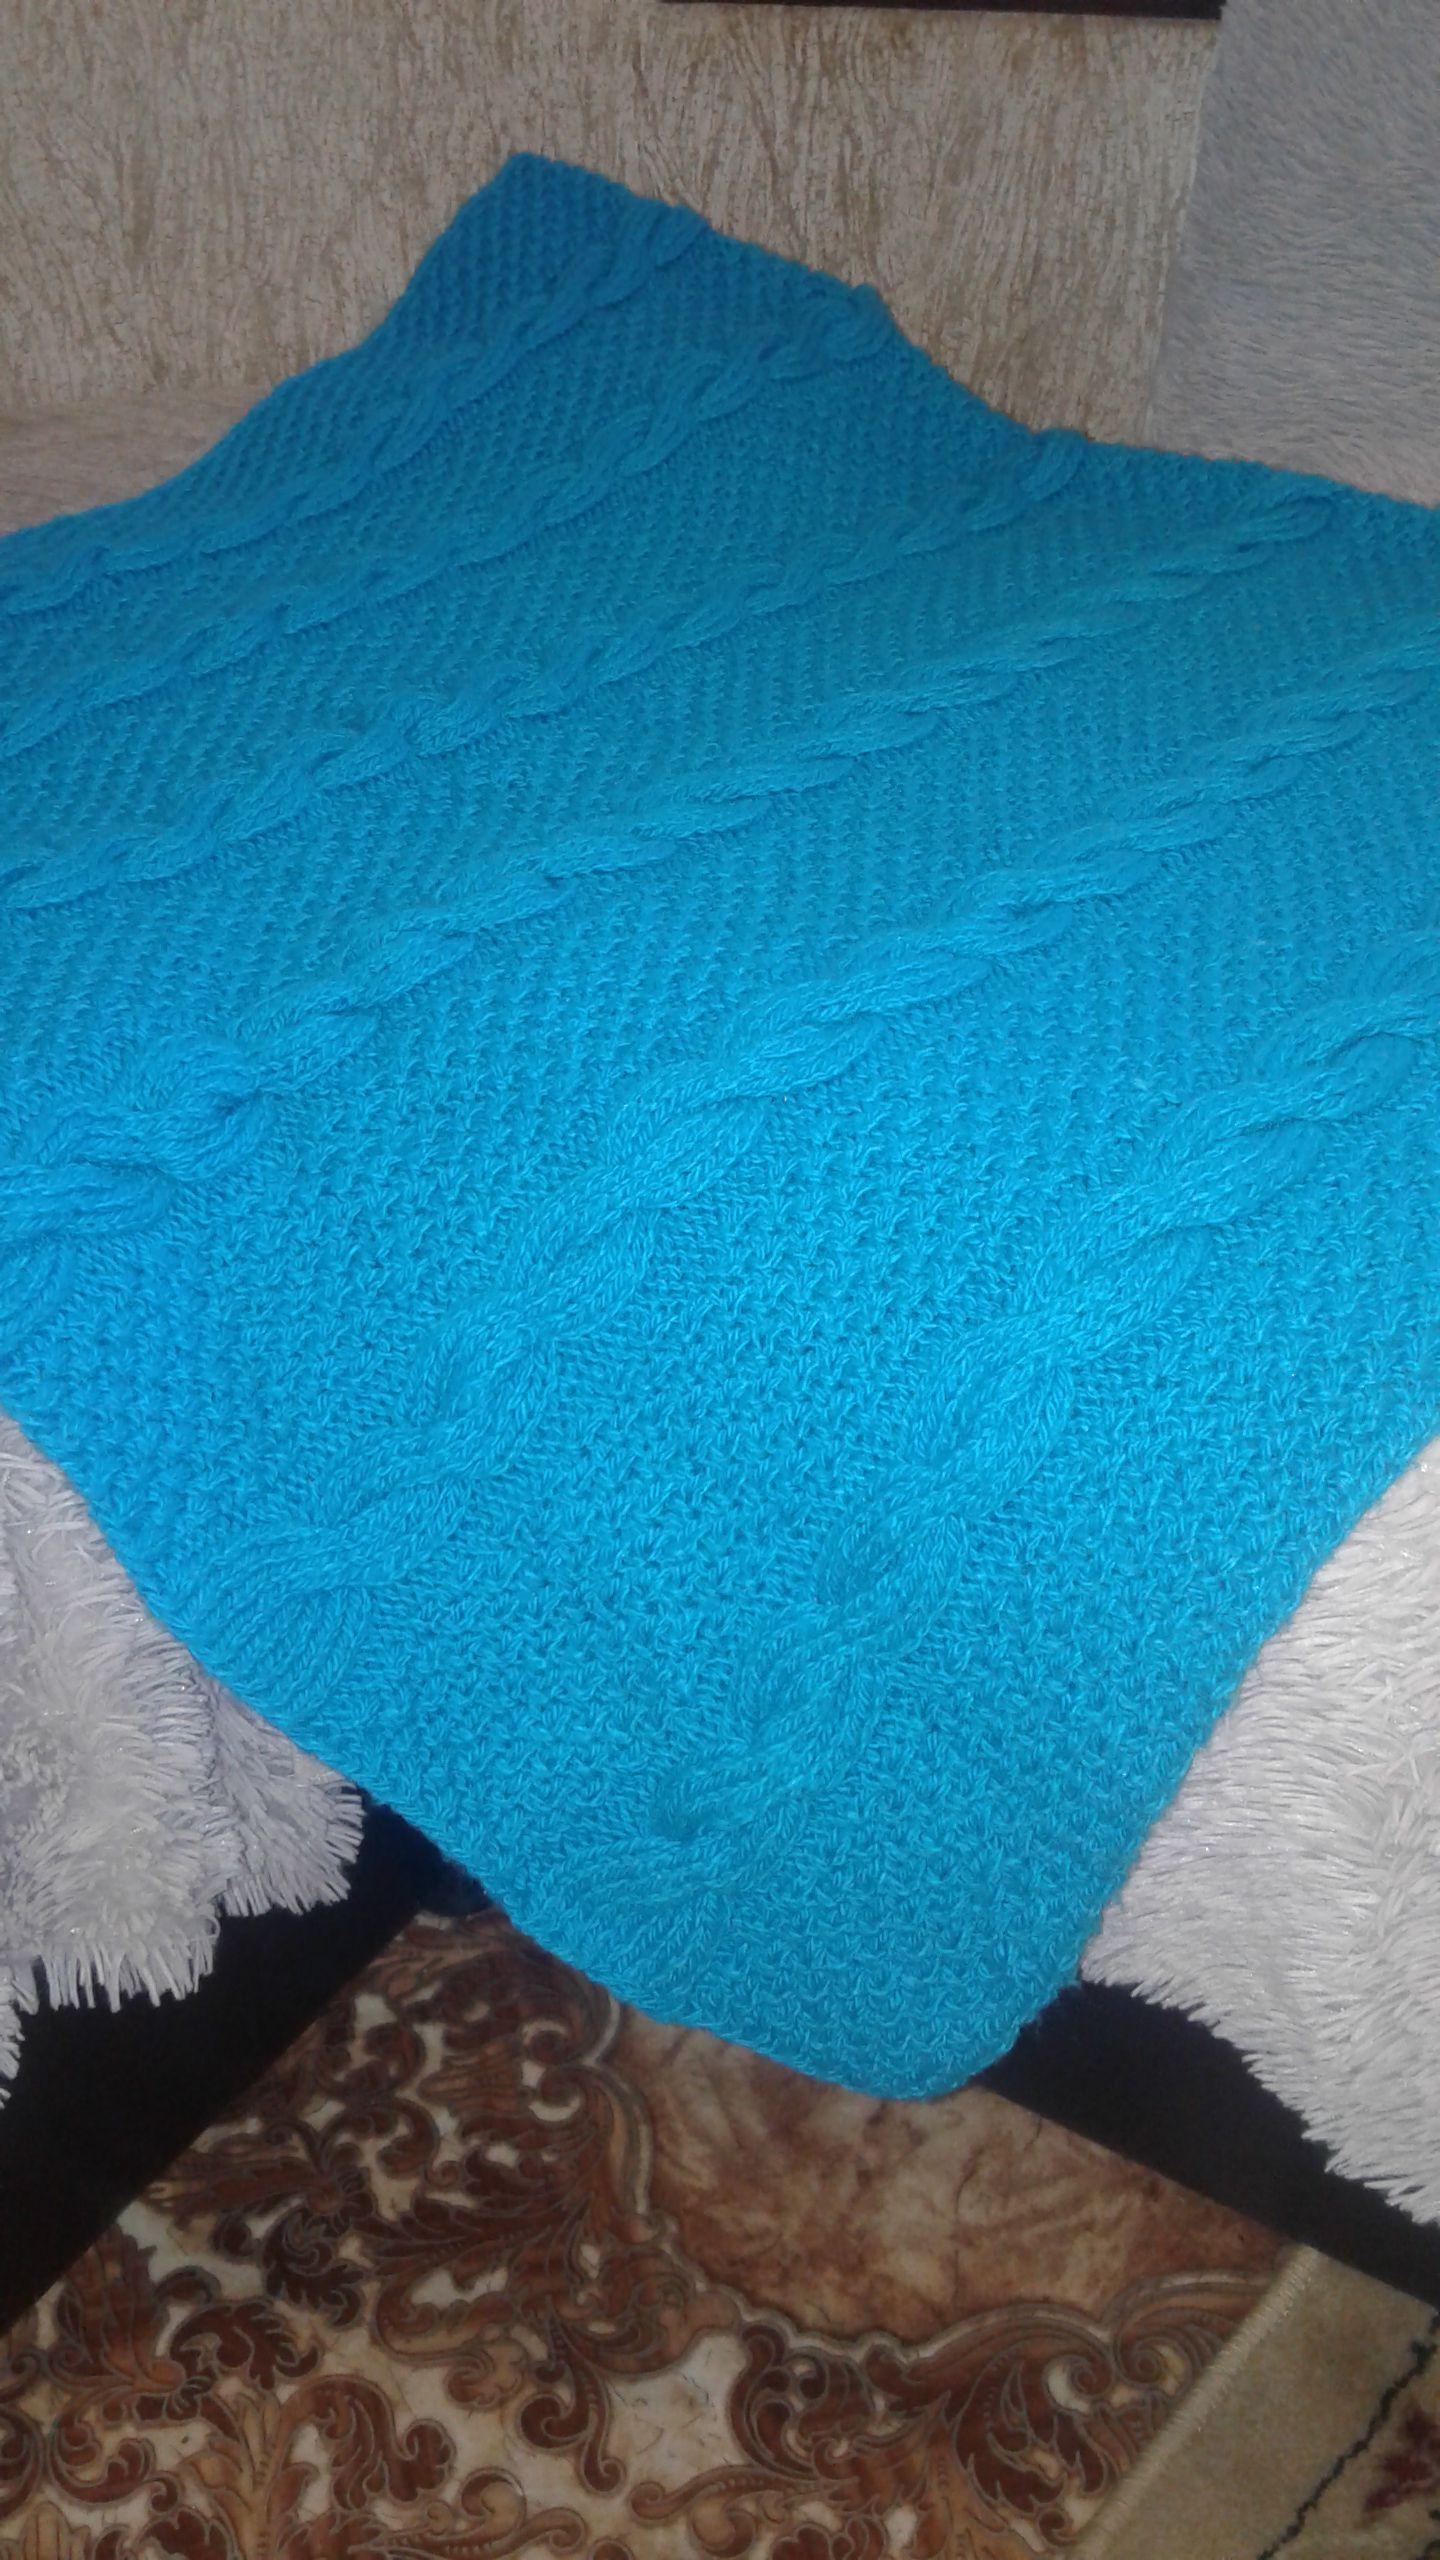 спицами пледскосами плед спицы вязание синий косы